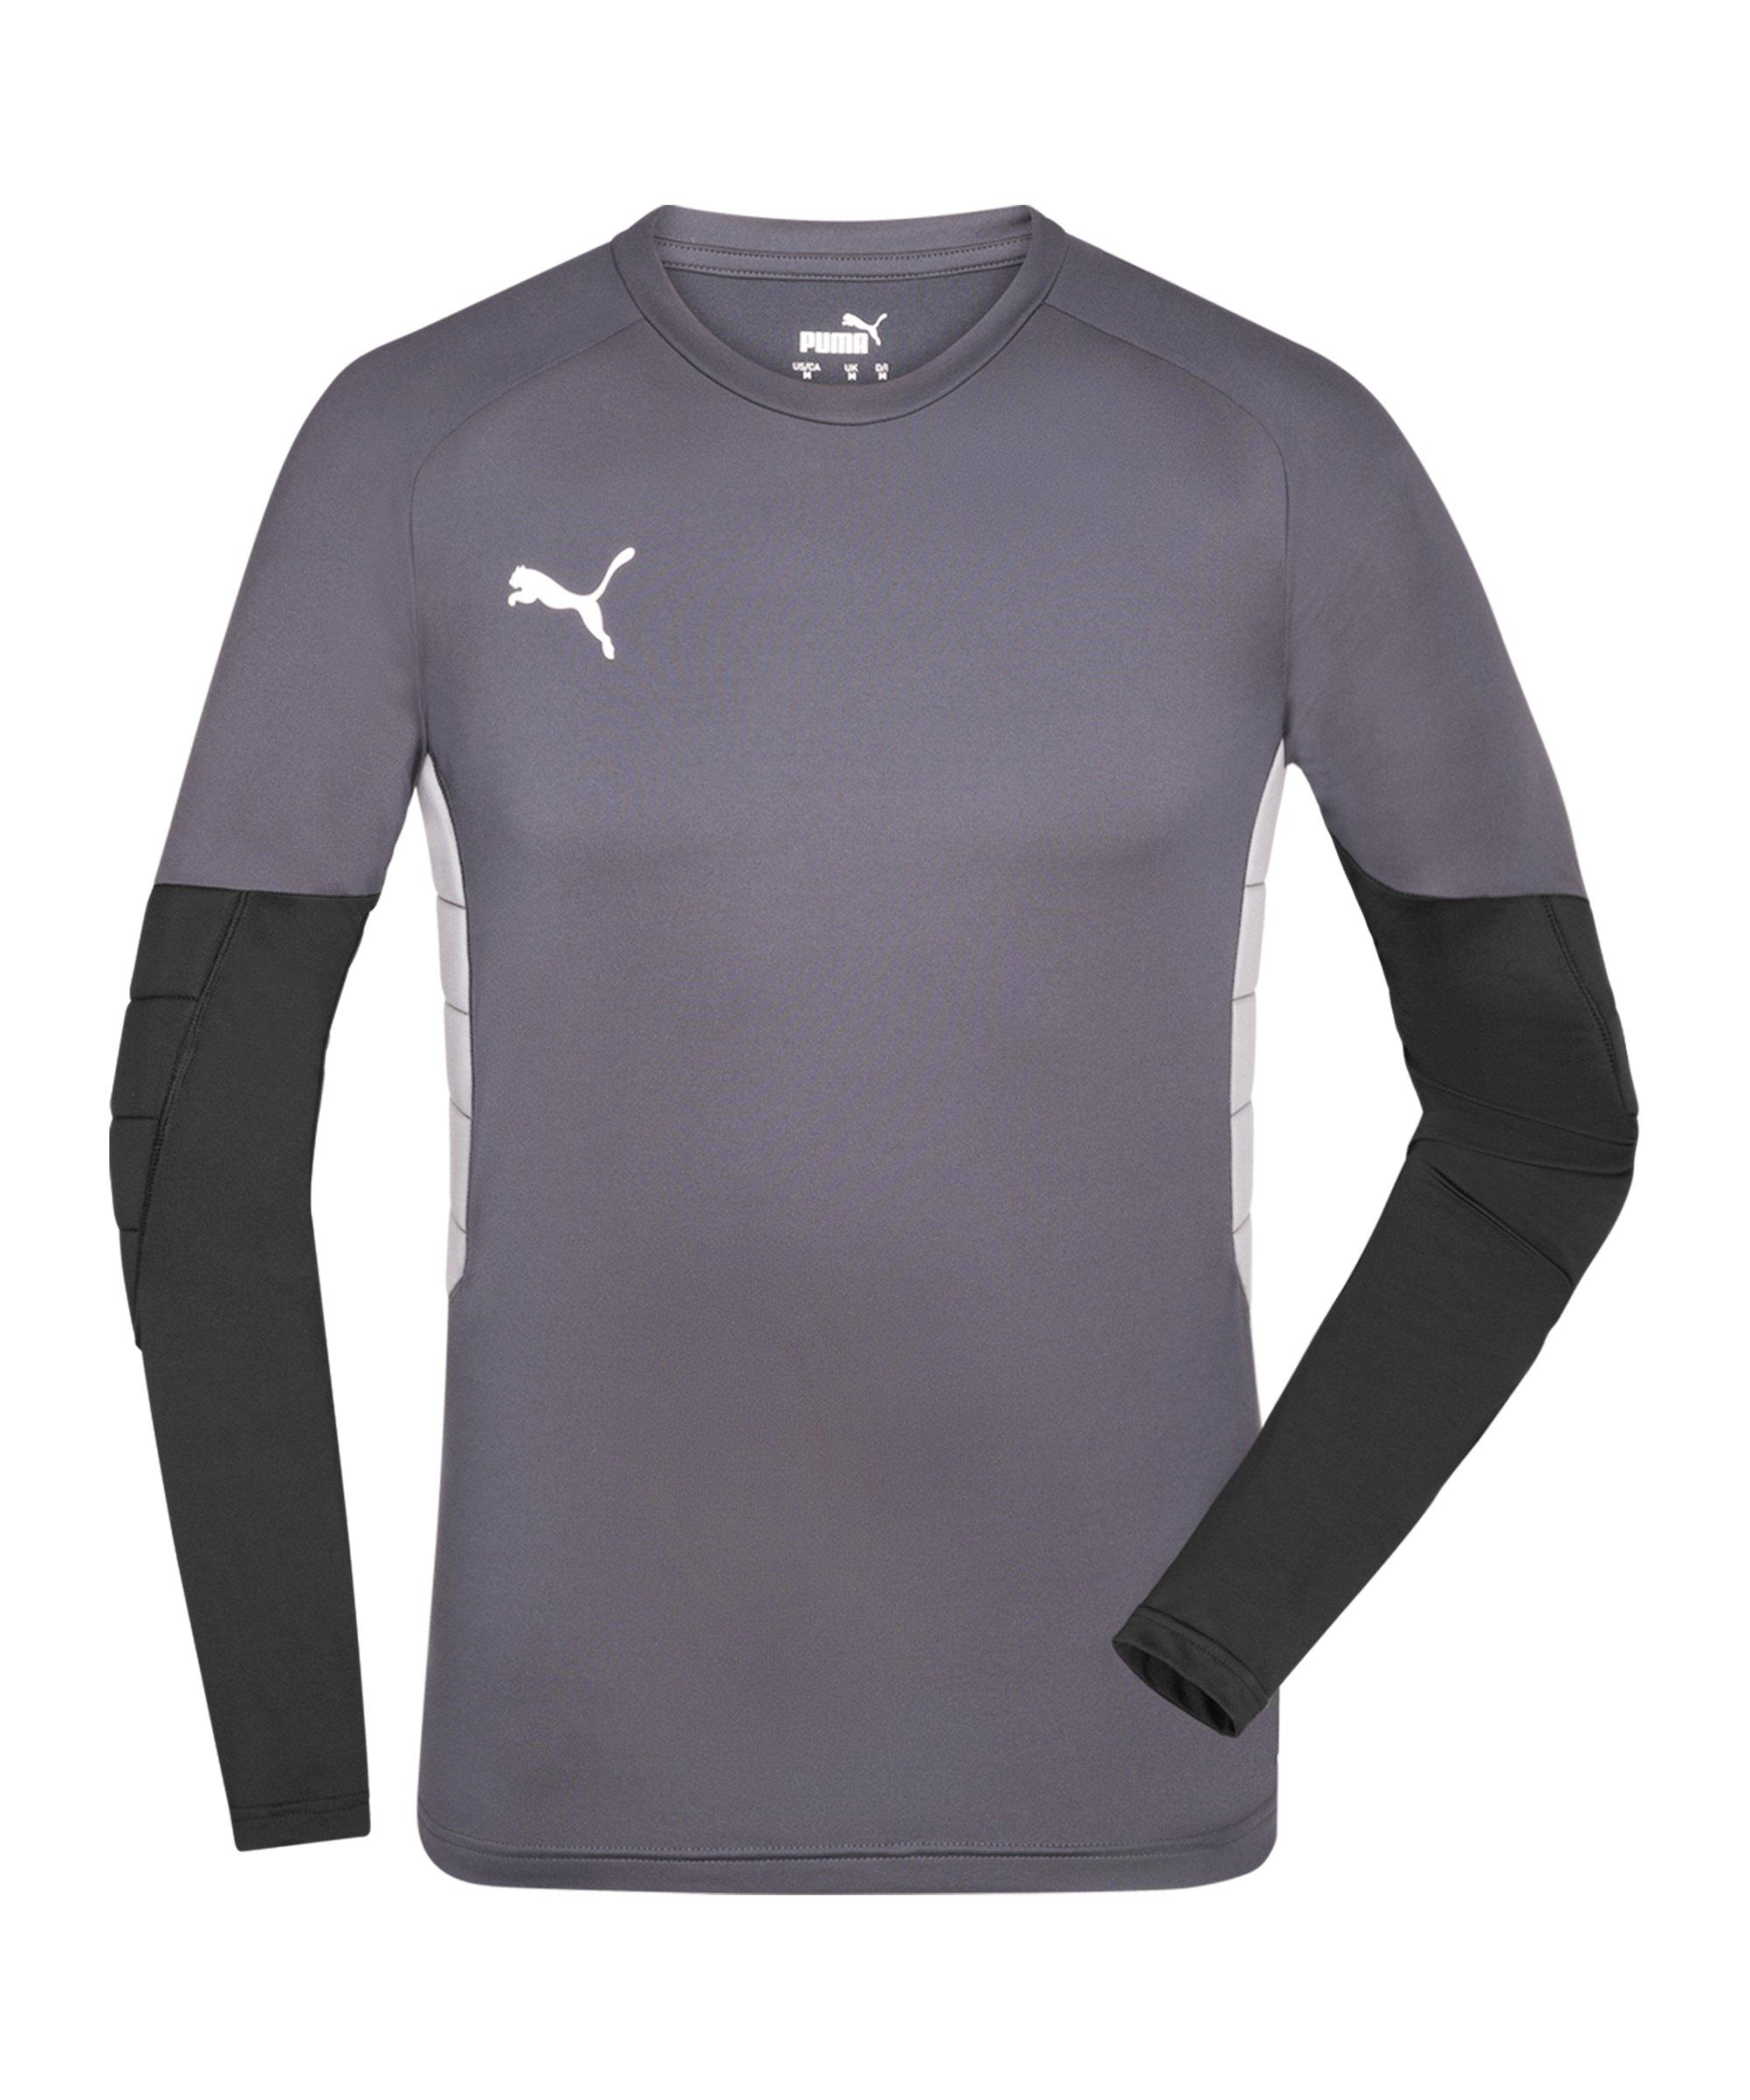 PUMA Torwarttrikot GK Padded Shirt Grau F60 - grau